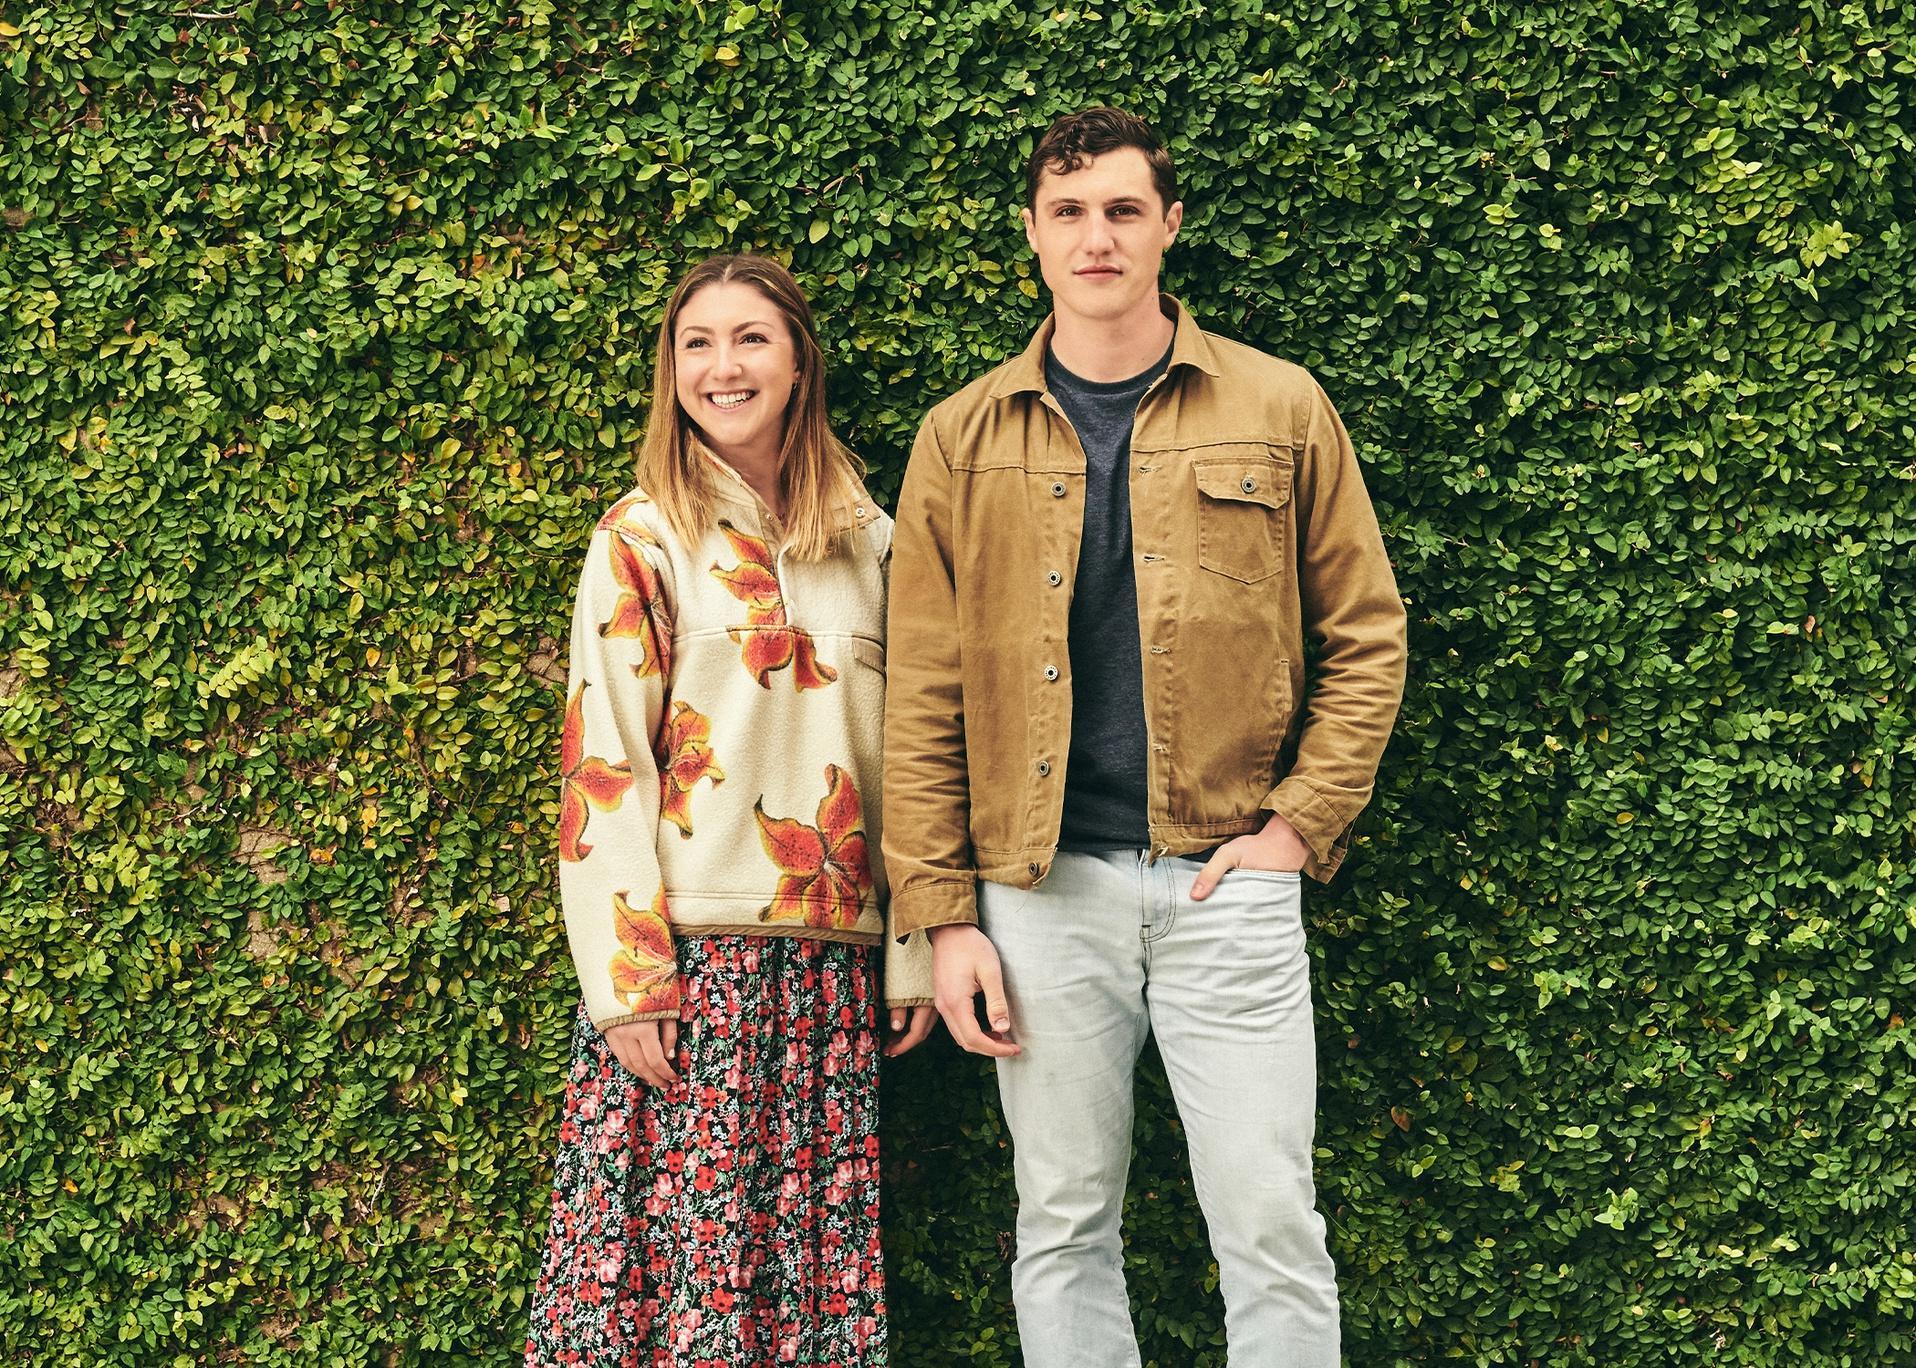 Jake and Caroline Danehy